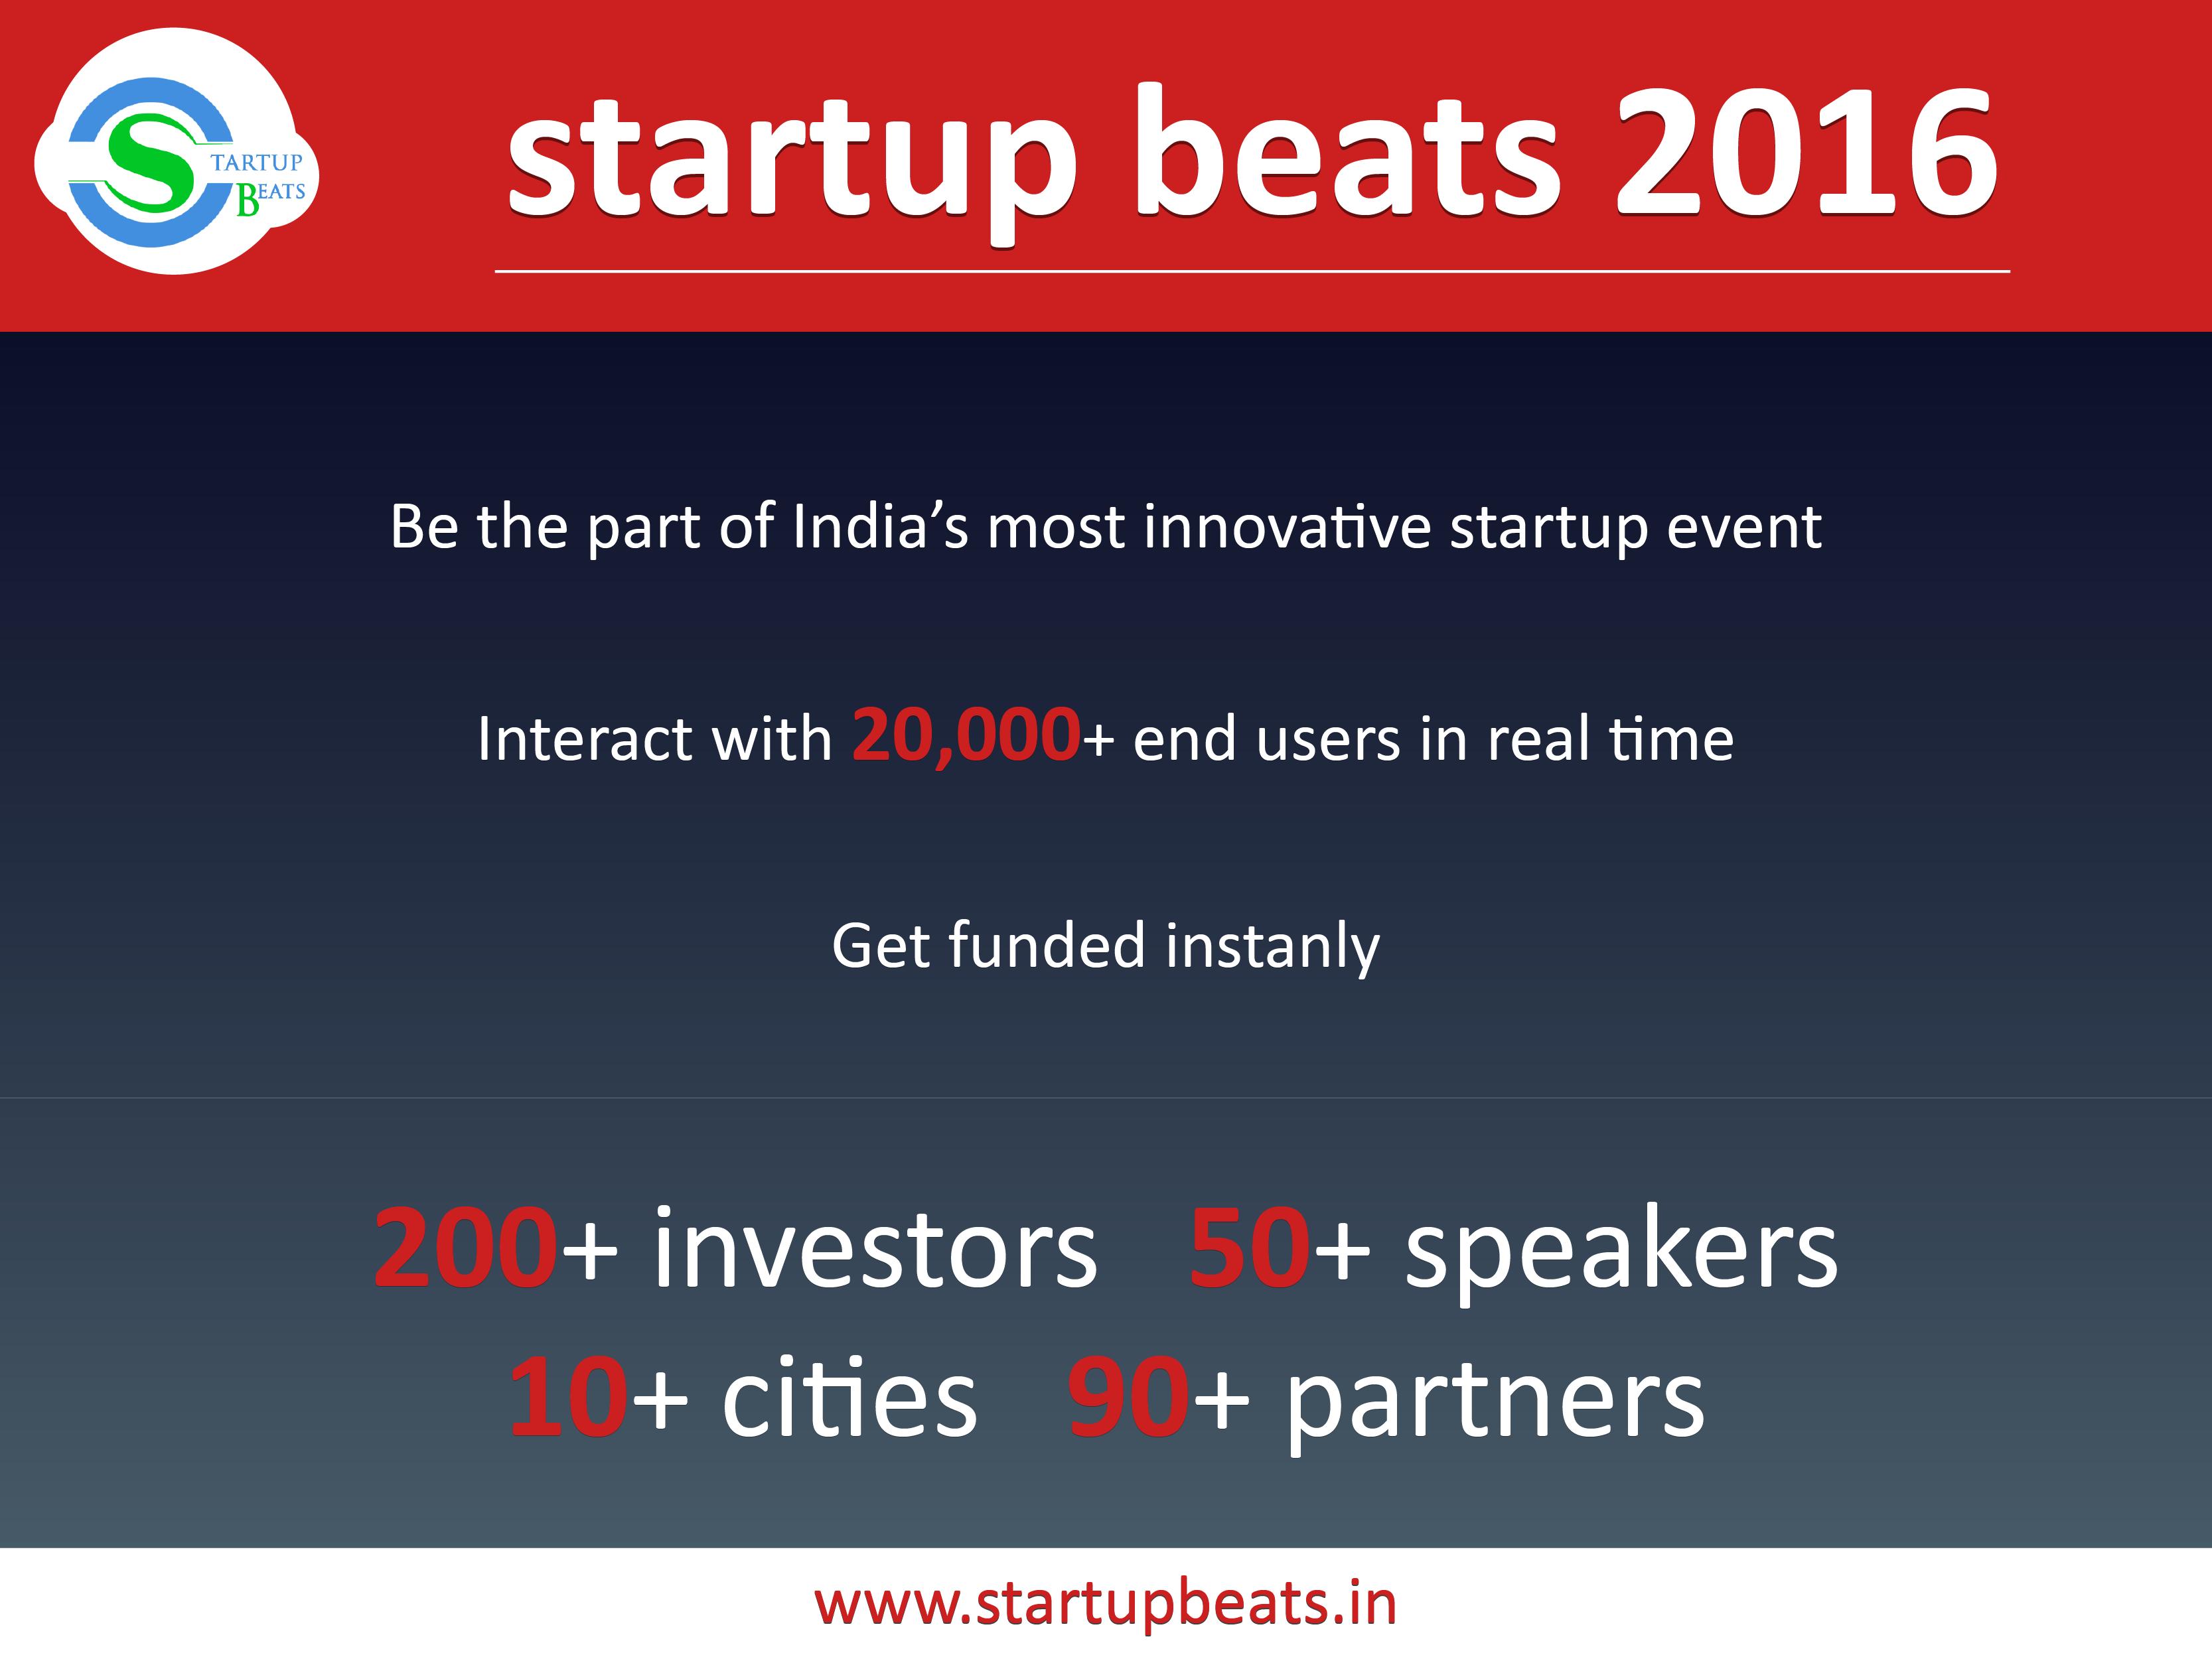 Startup Beats Event